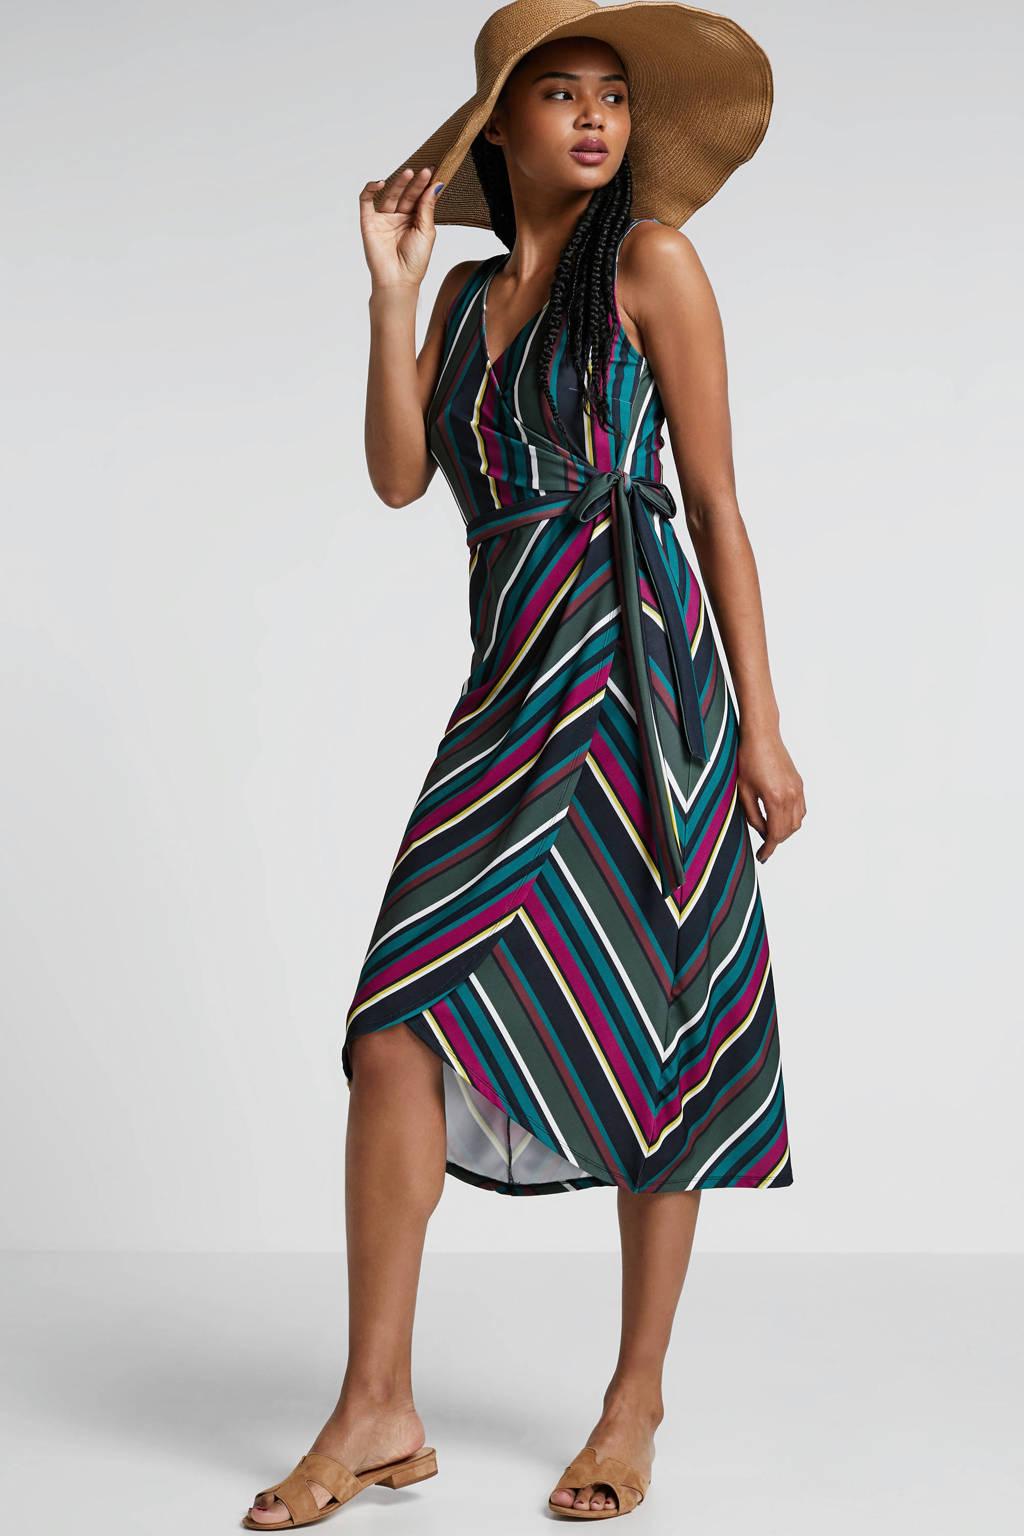 whkmp's beachwave wikkel-look jurk met streepprint, Donkergoen/roze